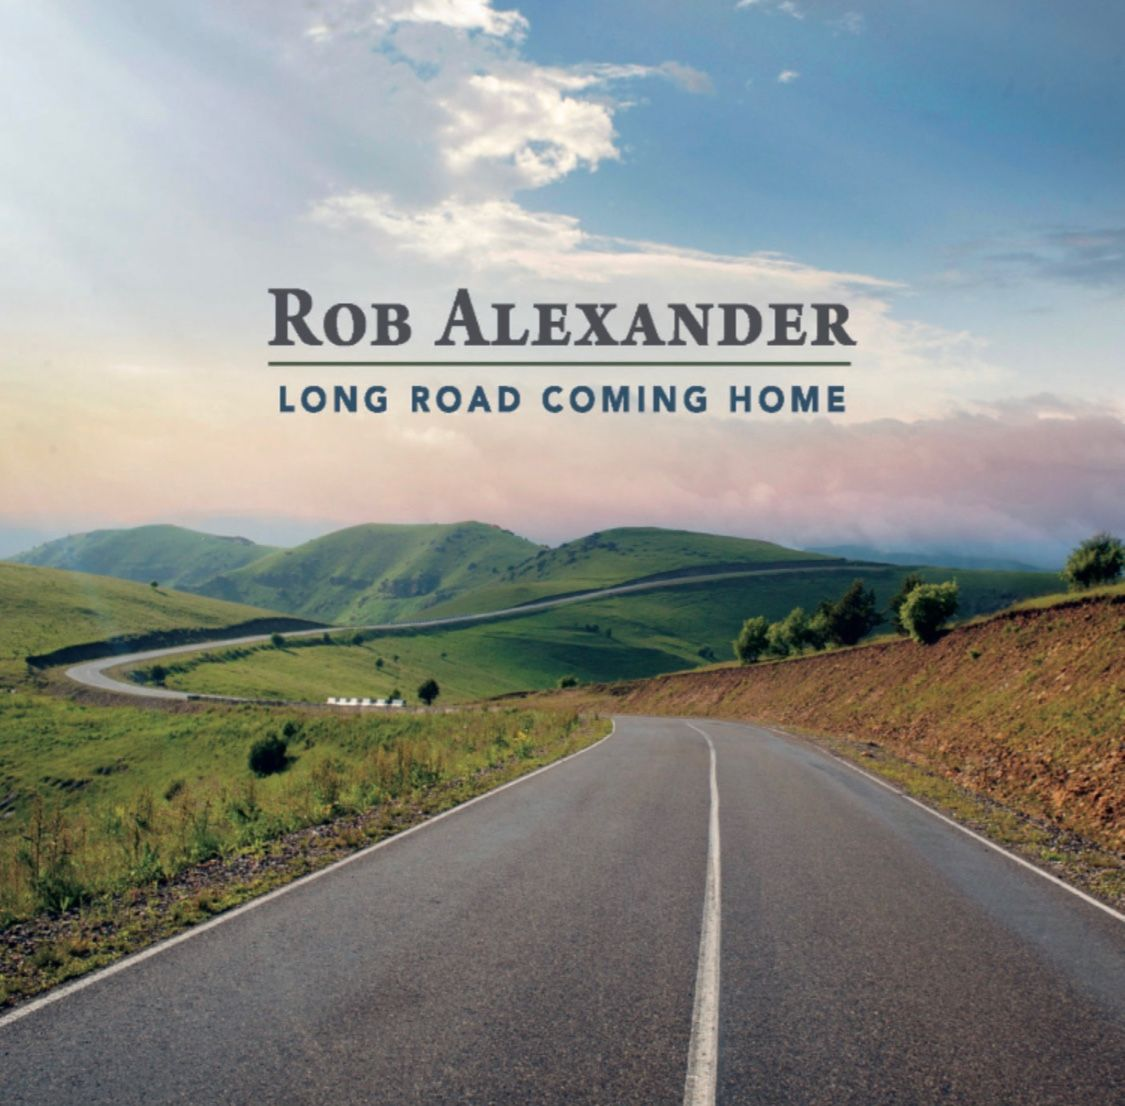 Rob Alexander